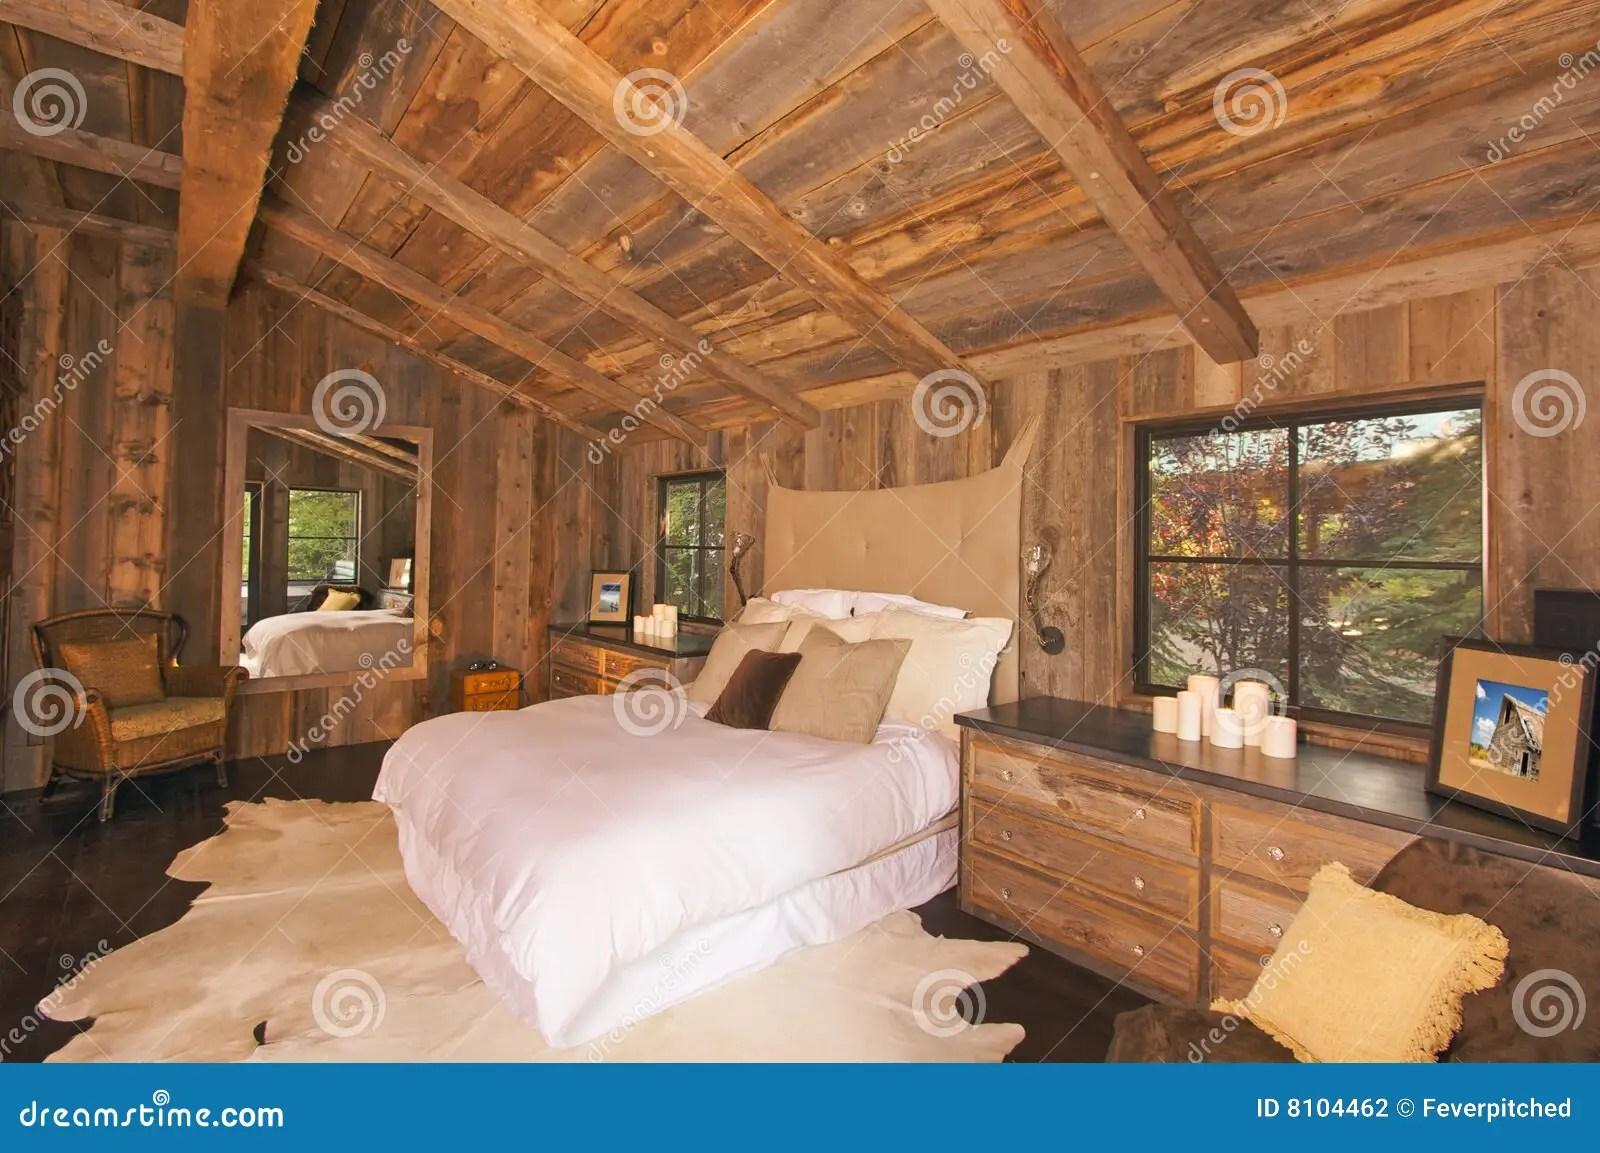 Schlafzimmer Rustikal Trafficdacoit Com Hausgestaltung Ideen Traum ... Traum Wohnzimmer Rustikal